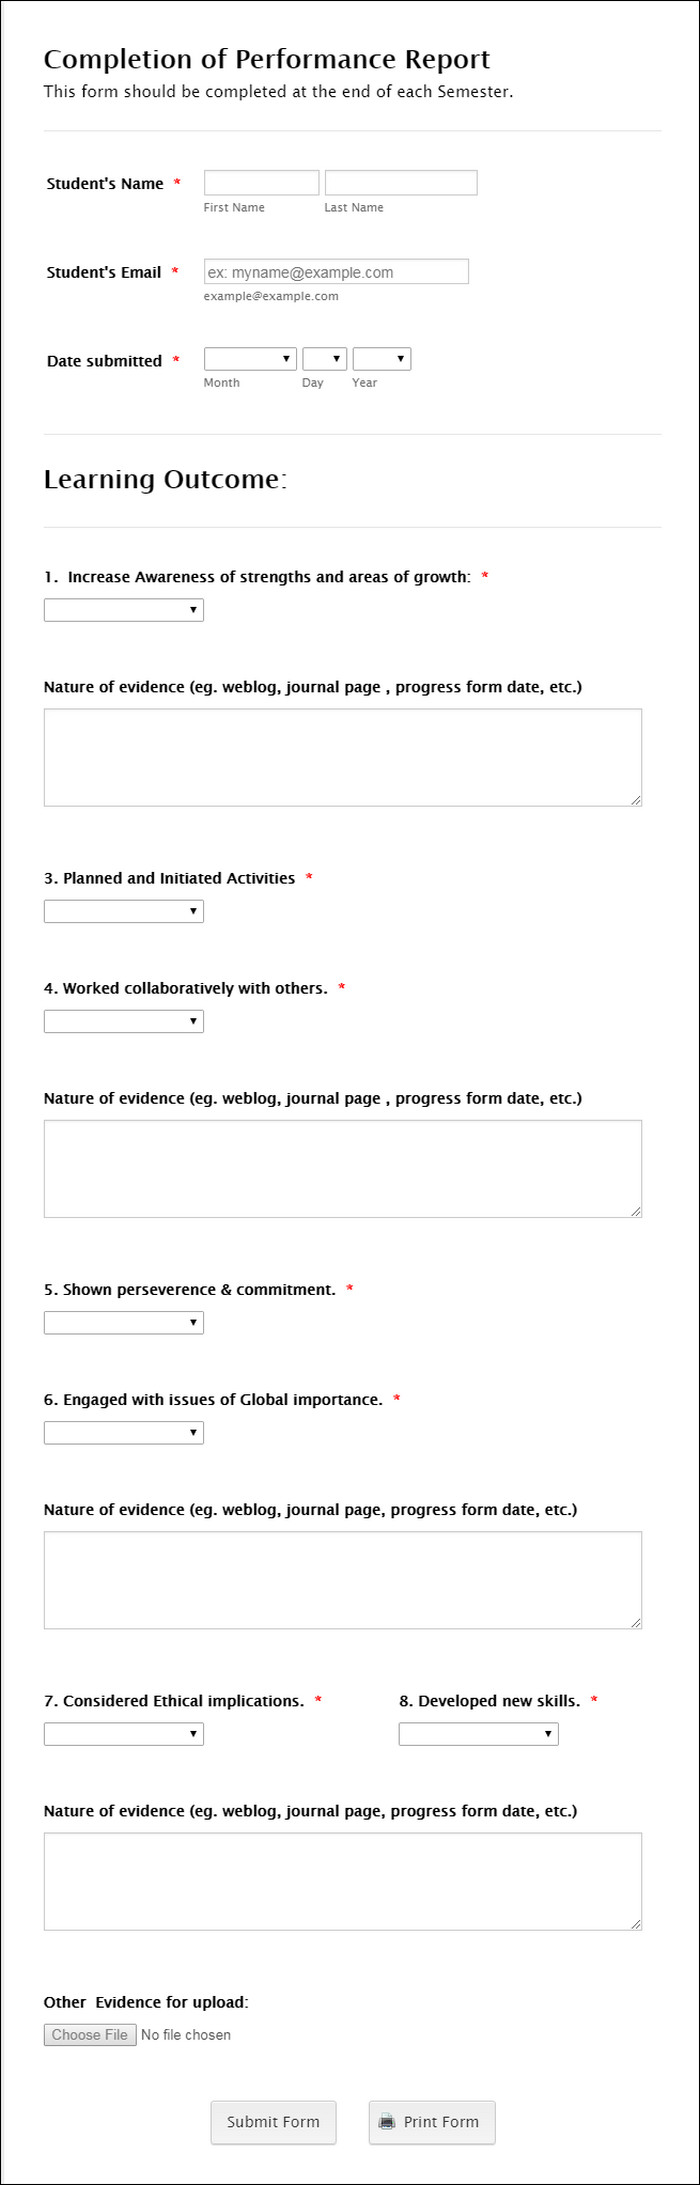 Contoh Kuesioner Online Universitas Student Perfomance Evaluation